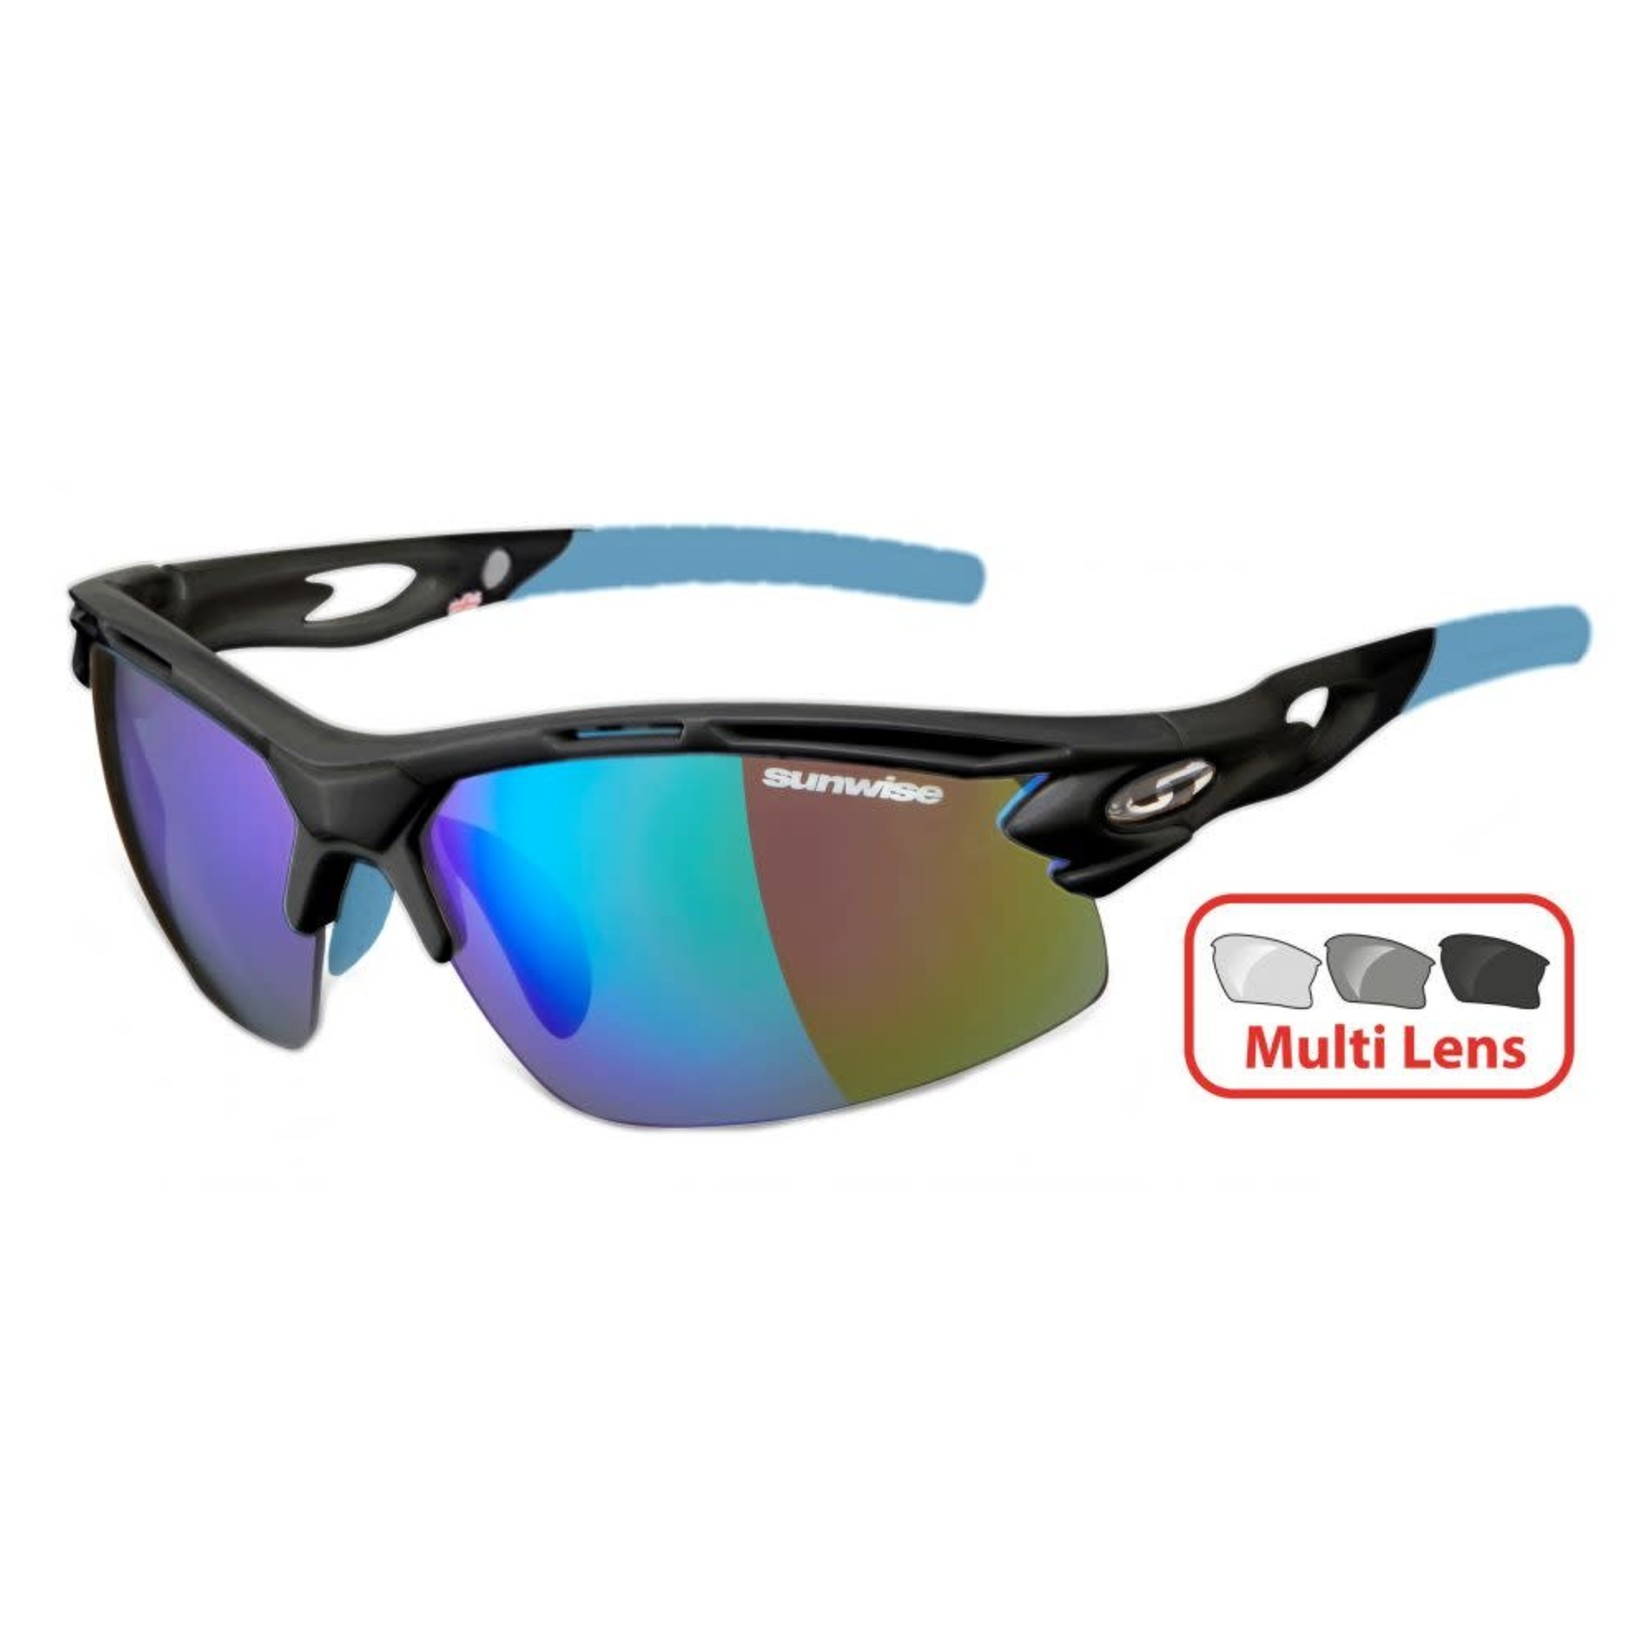 Sunwise Vertex Sunglasses Grey